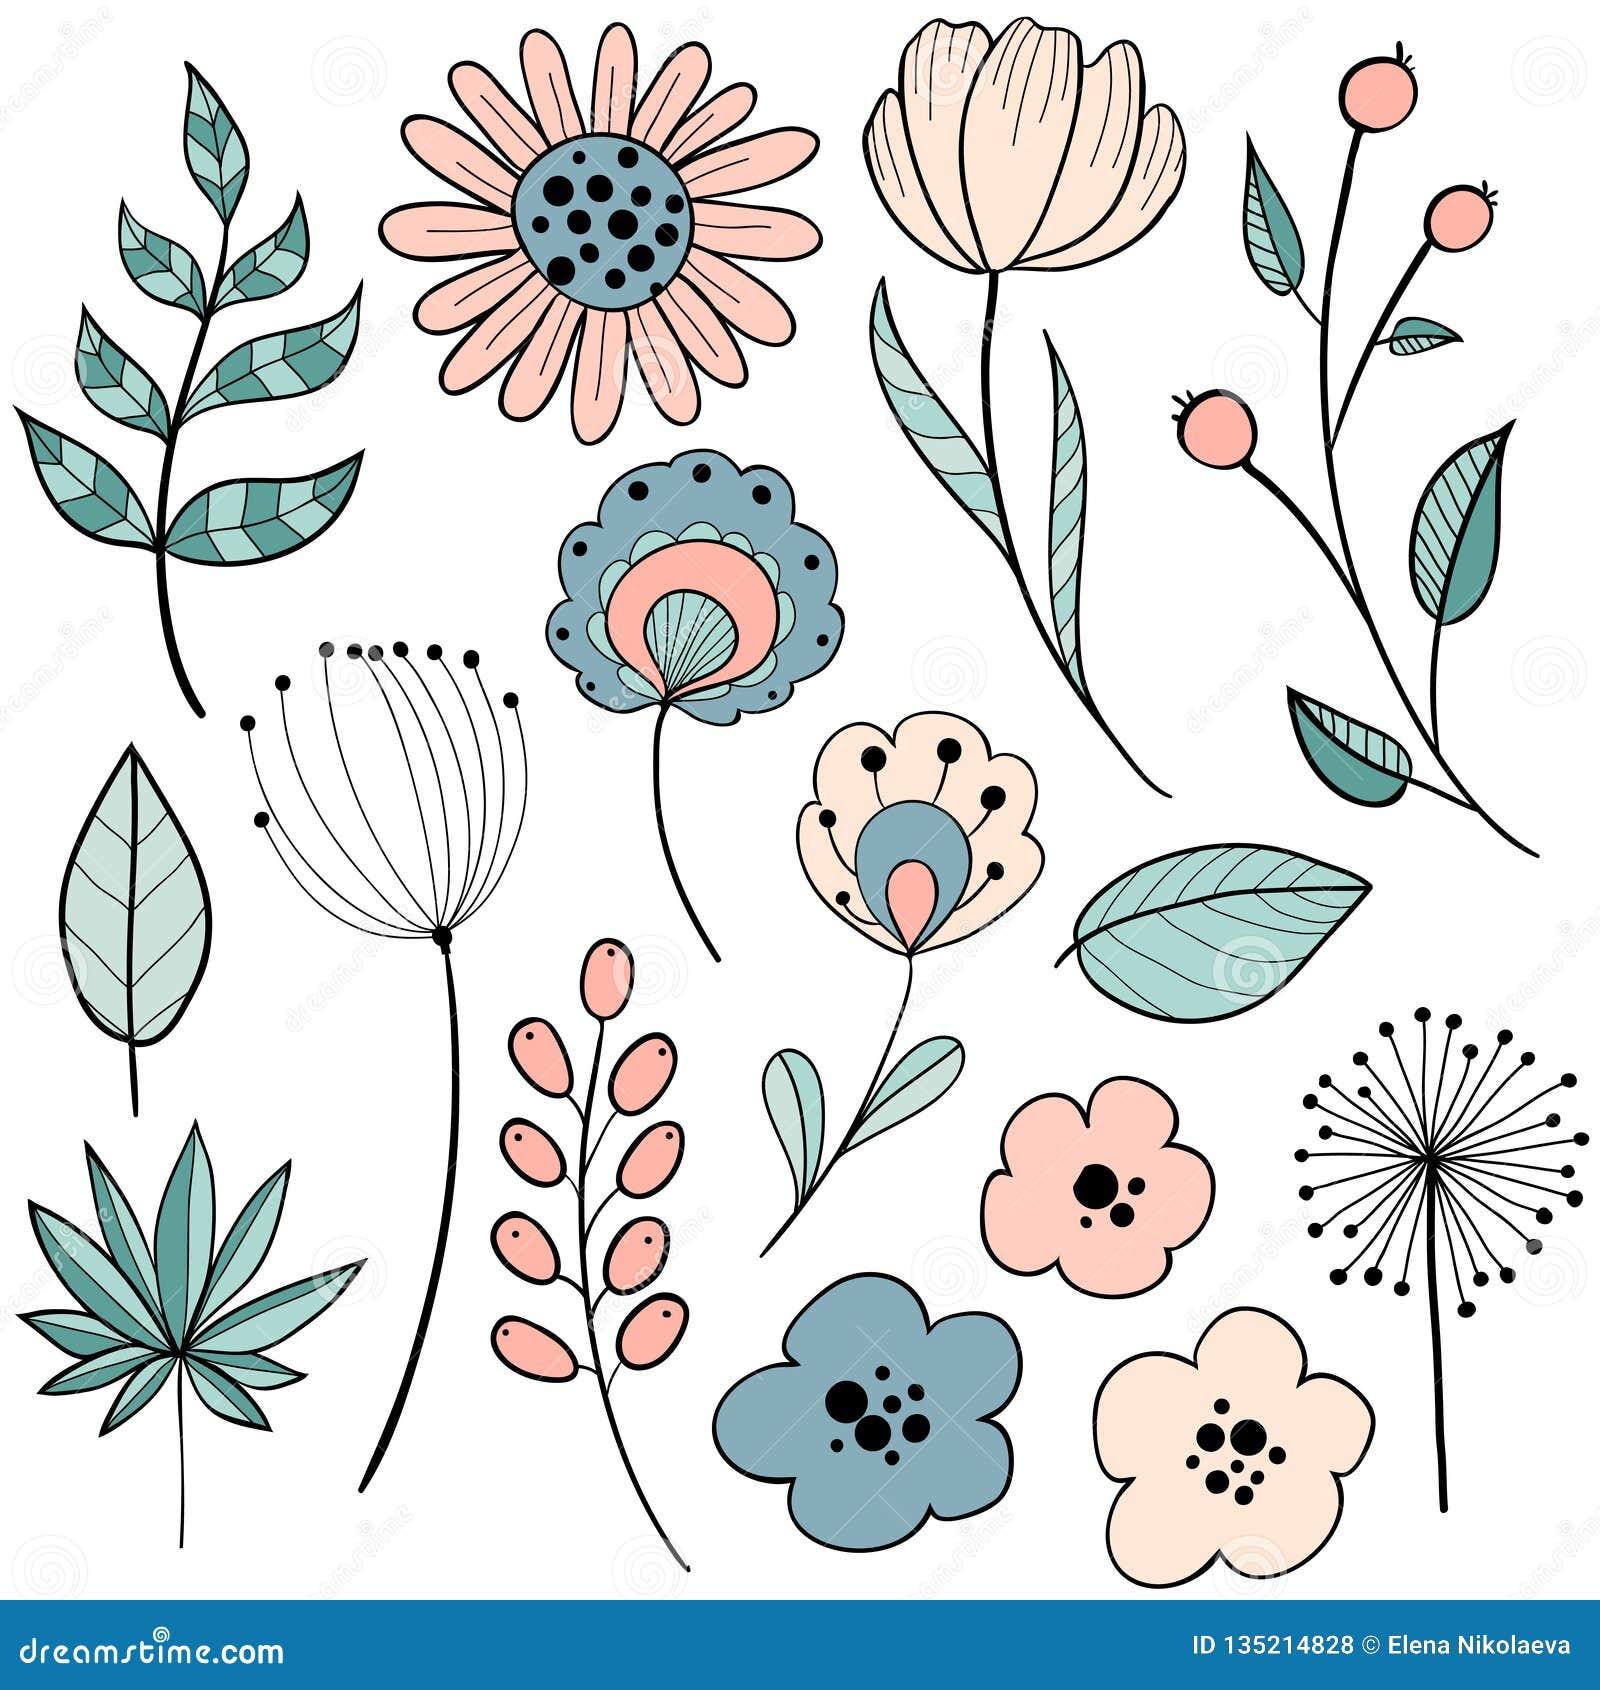 Flower Graphic Design Stock Vector Illustration Of Hipster 135214828